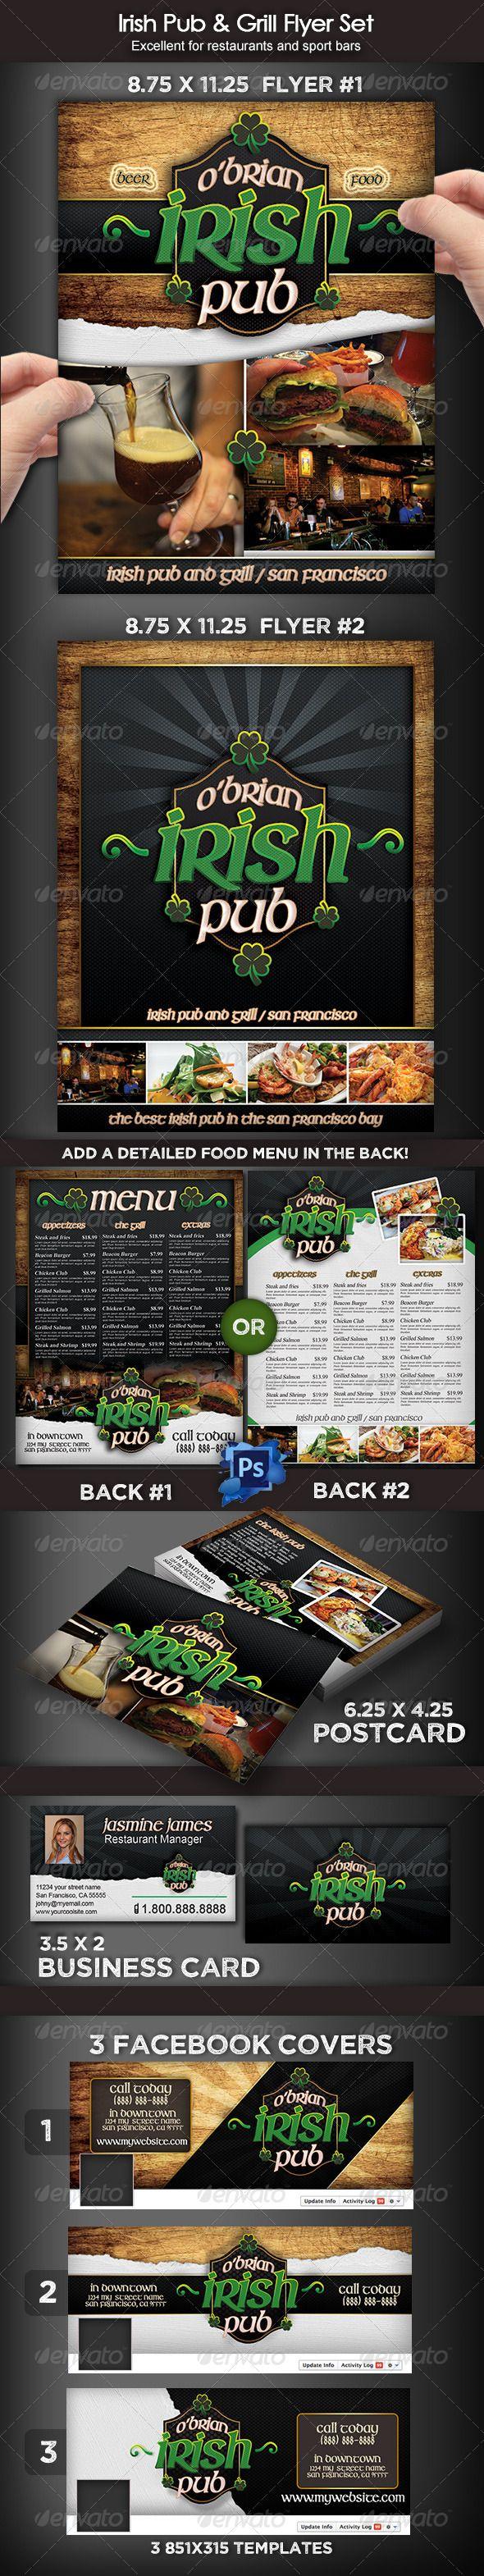 Irish Pub & Grill Flyer Set Template #design Download: http://graphicriver.net/item/irish-pub-grill-flyer-set/8191080?ref=ksioks